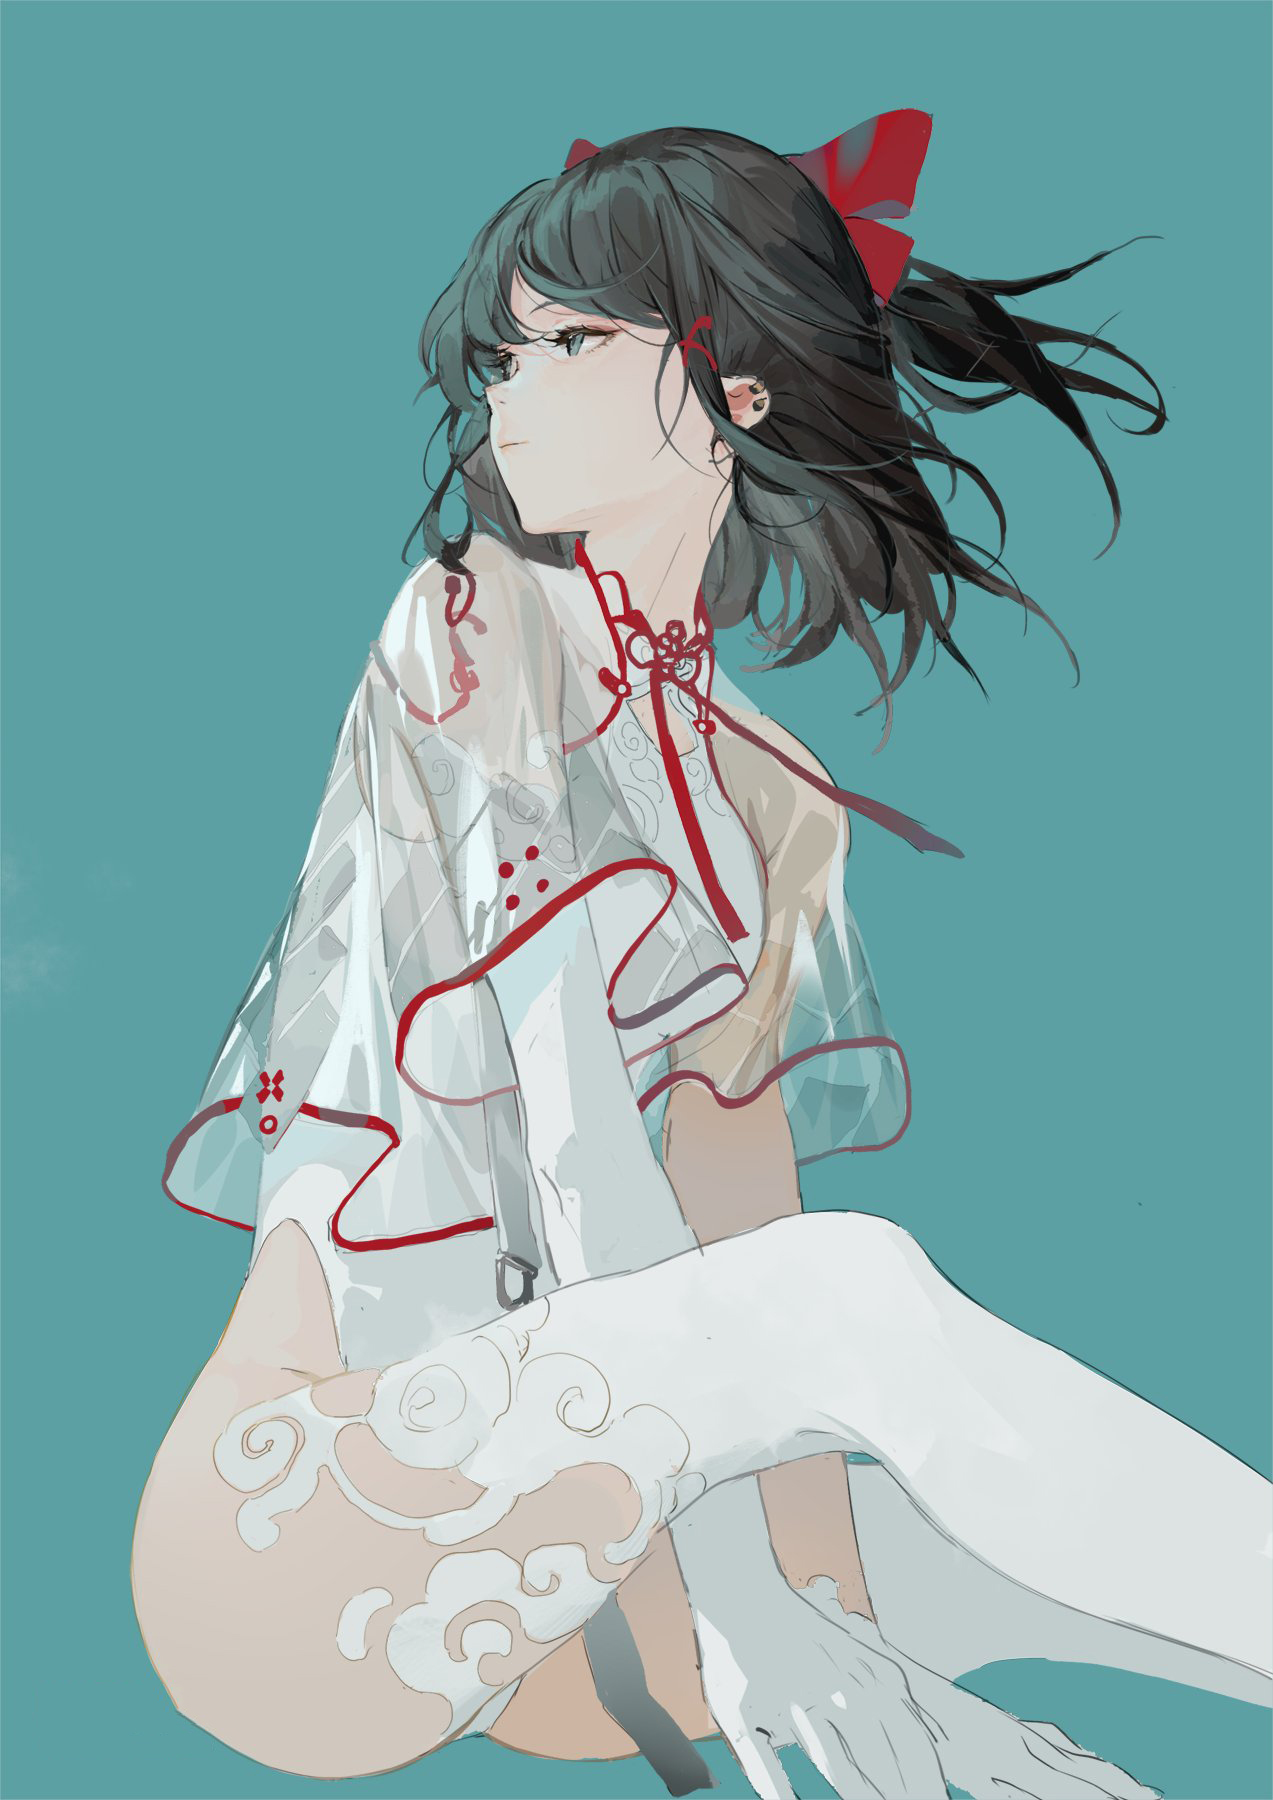 Anime 1273x1800 anime girls simple background stockings artwork digital art maiwetea Touhou Hakurei Reimu hands between legs dark hair Chinese clothing REEH